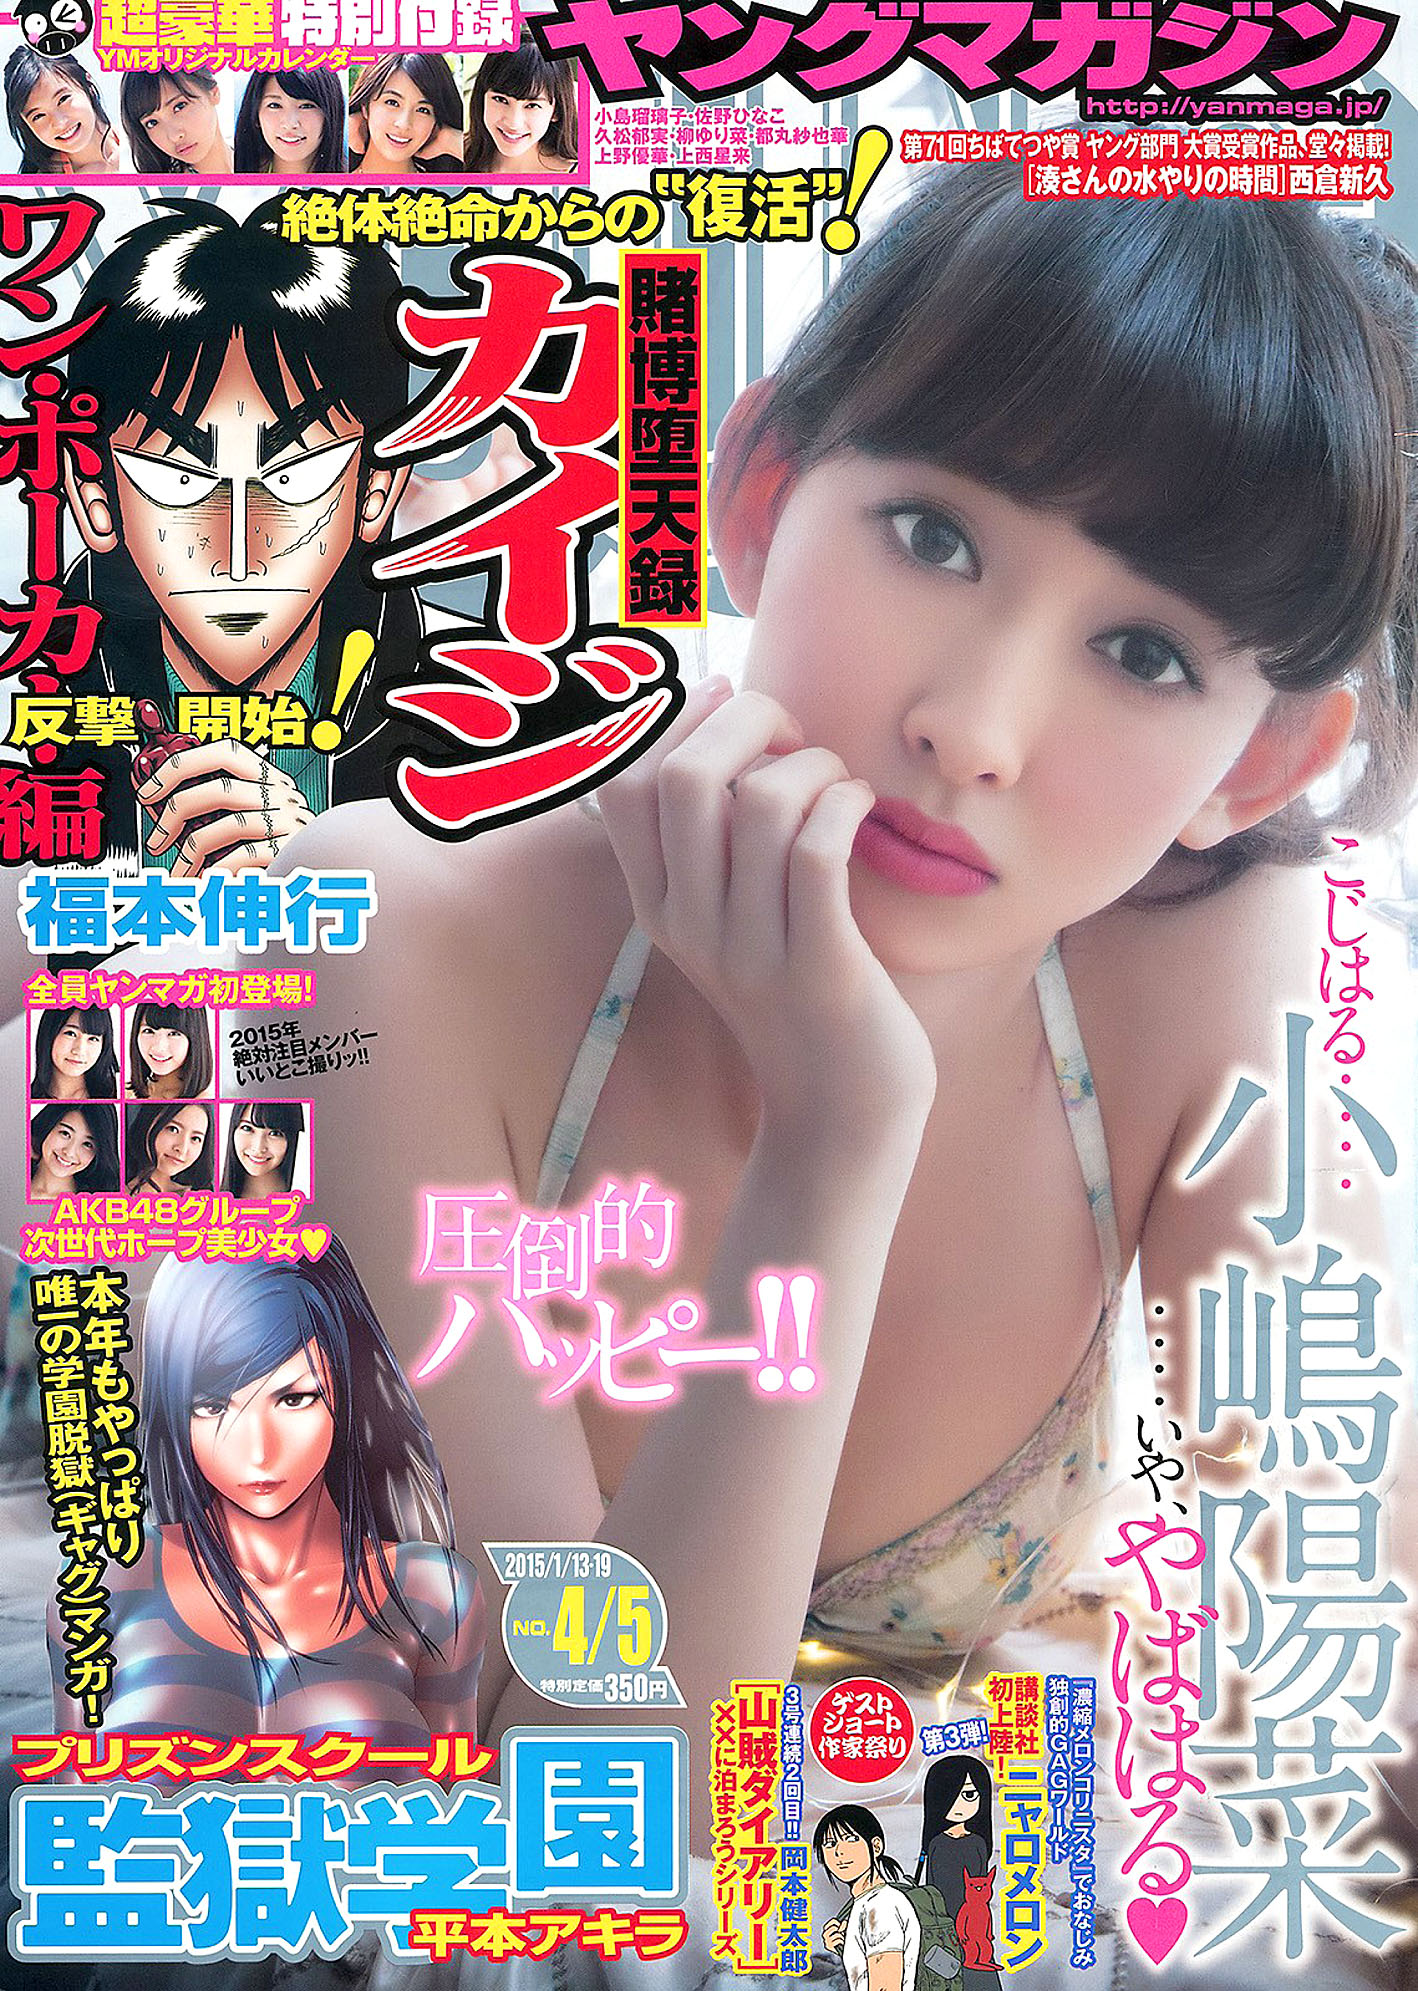 HKojima Young Magazine 150119 01.jpg